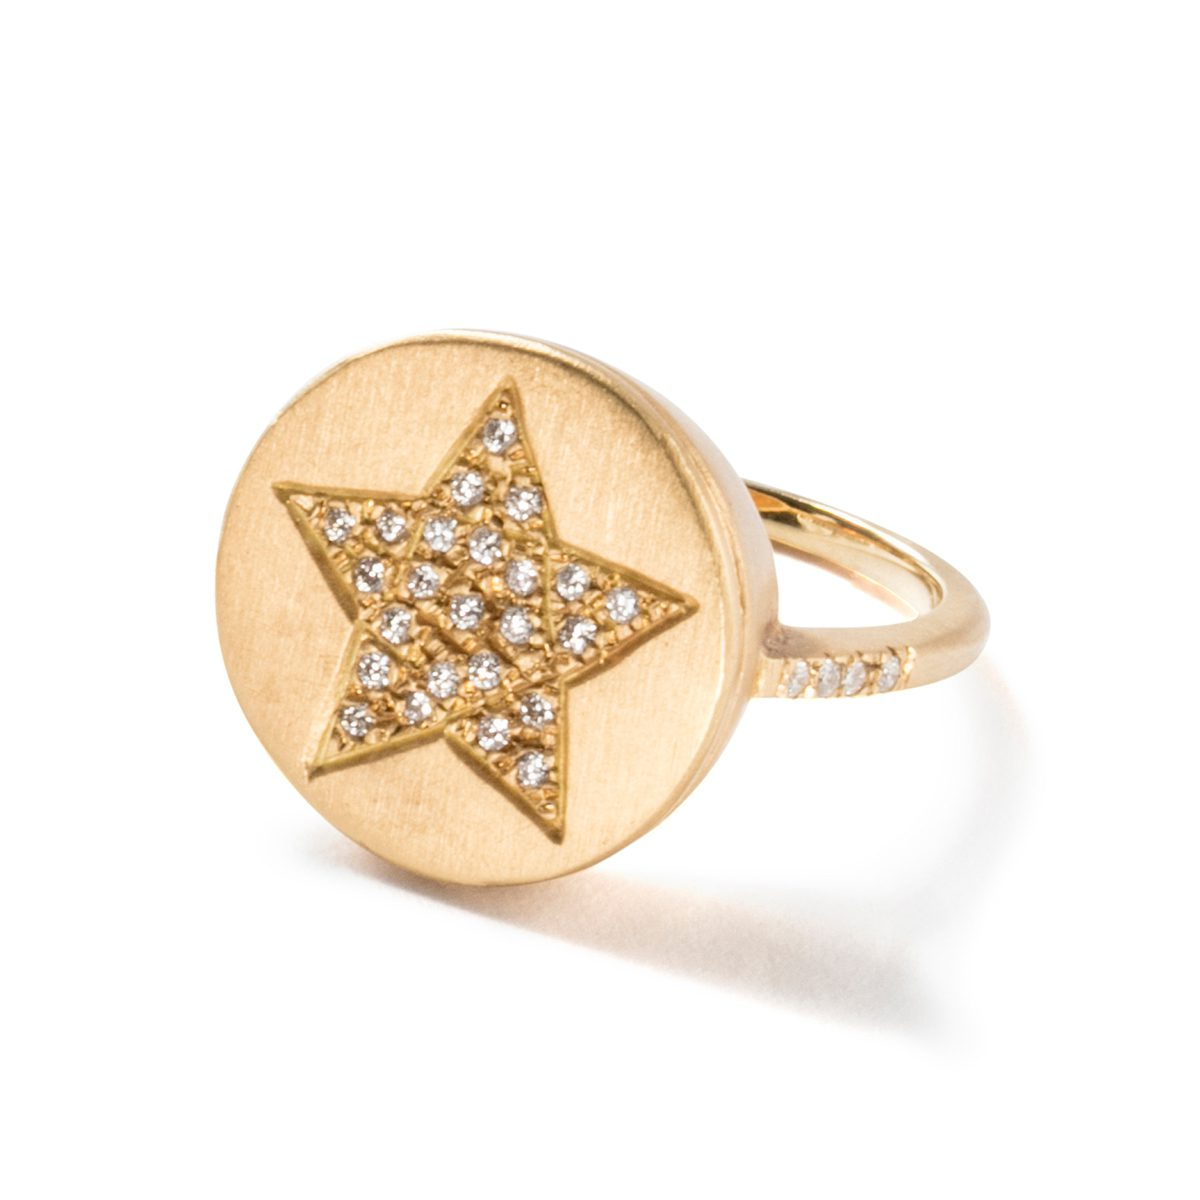 Calorina Bucci - STAMP RING|Rings